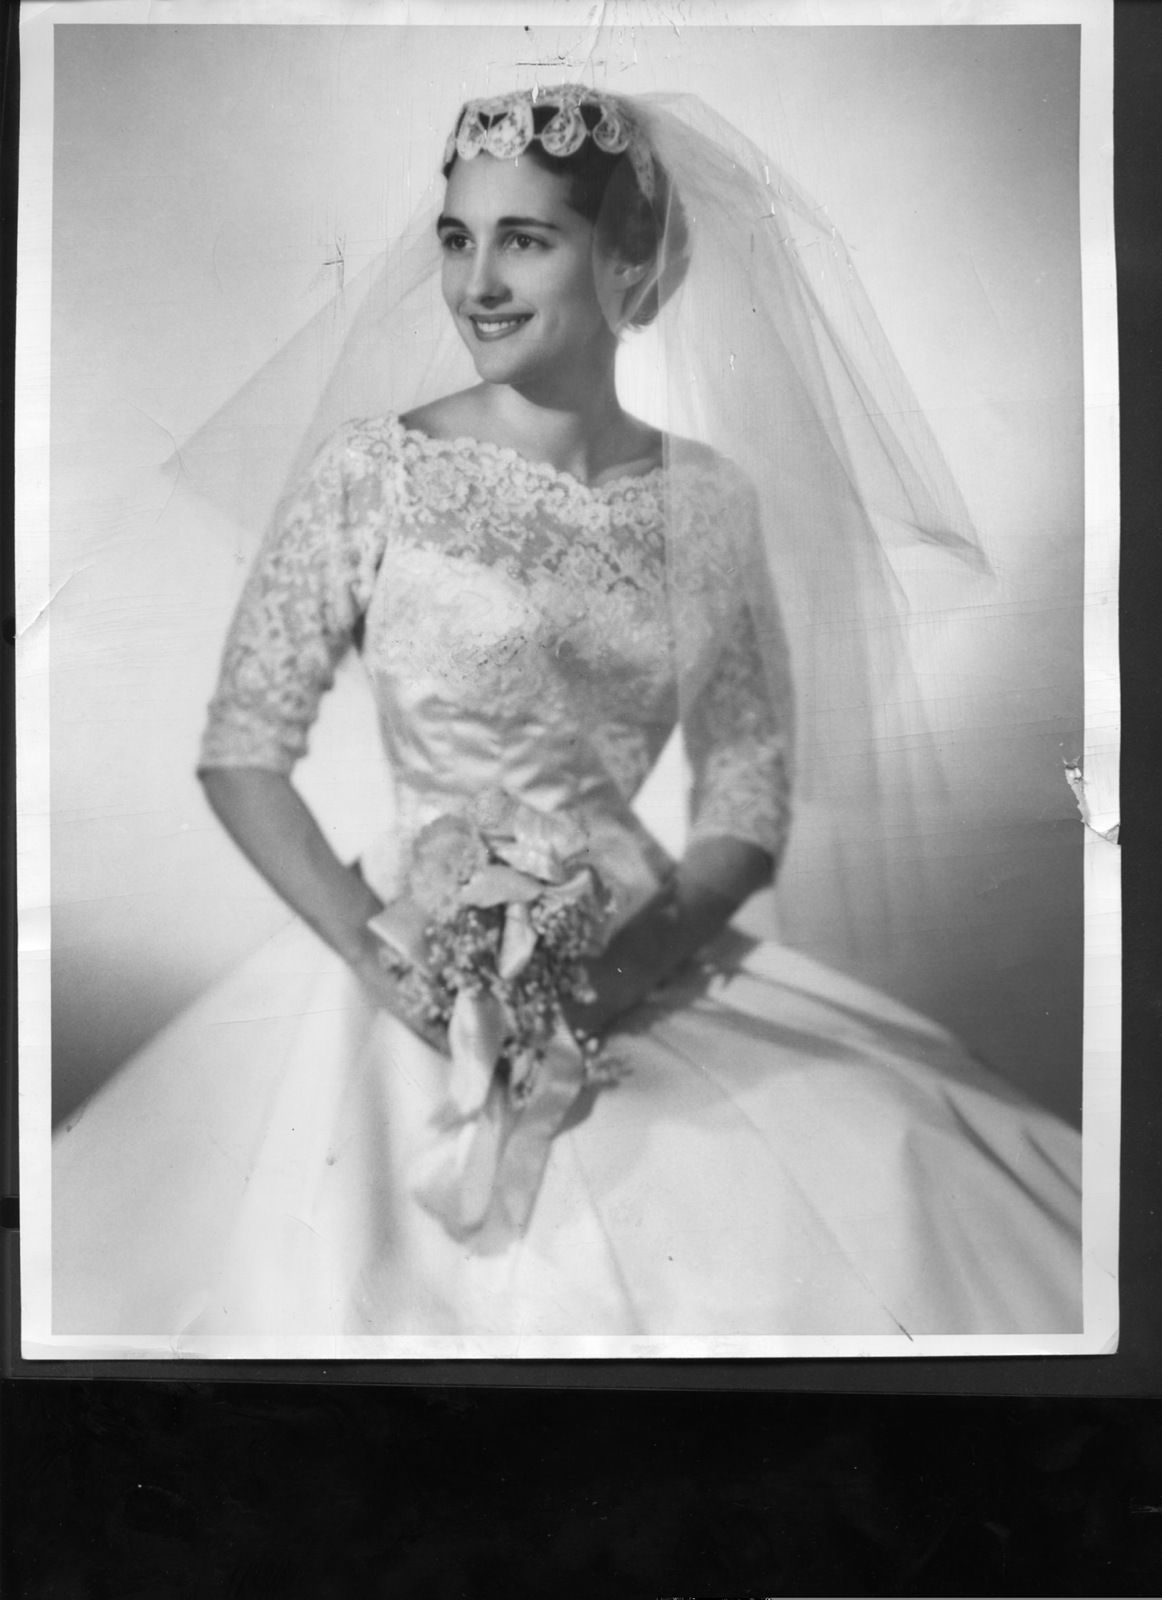 News Photo Bride Katharine Frankenthal (groom Robert McMillan) Chicago 1957